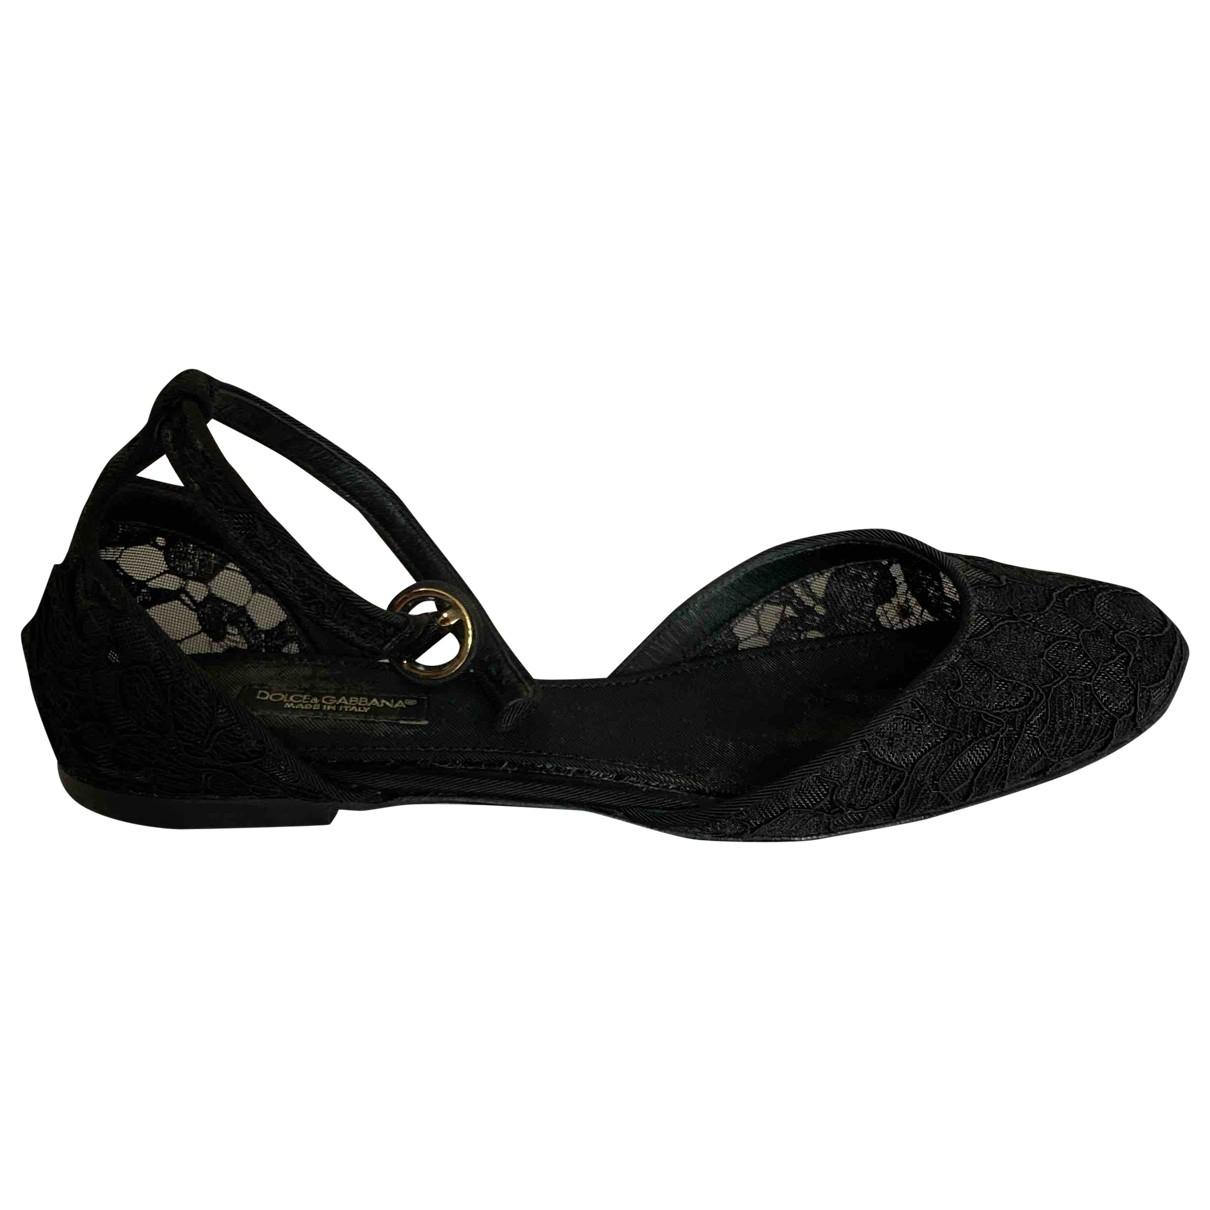 Dolce & Gabbana - Ballerines Taormina pour femme en toile - noir